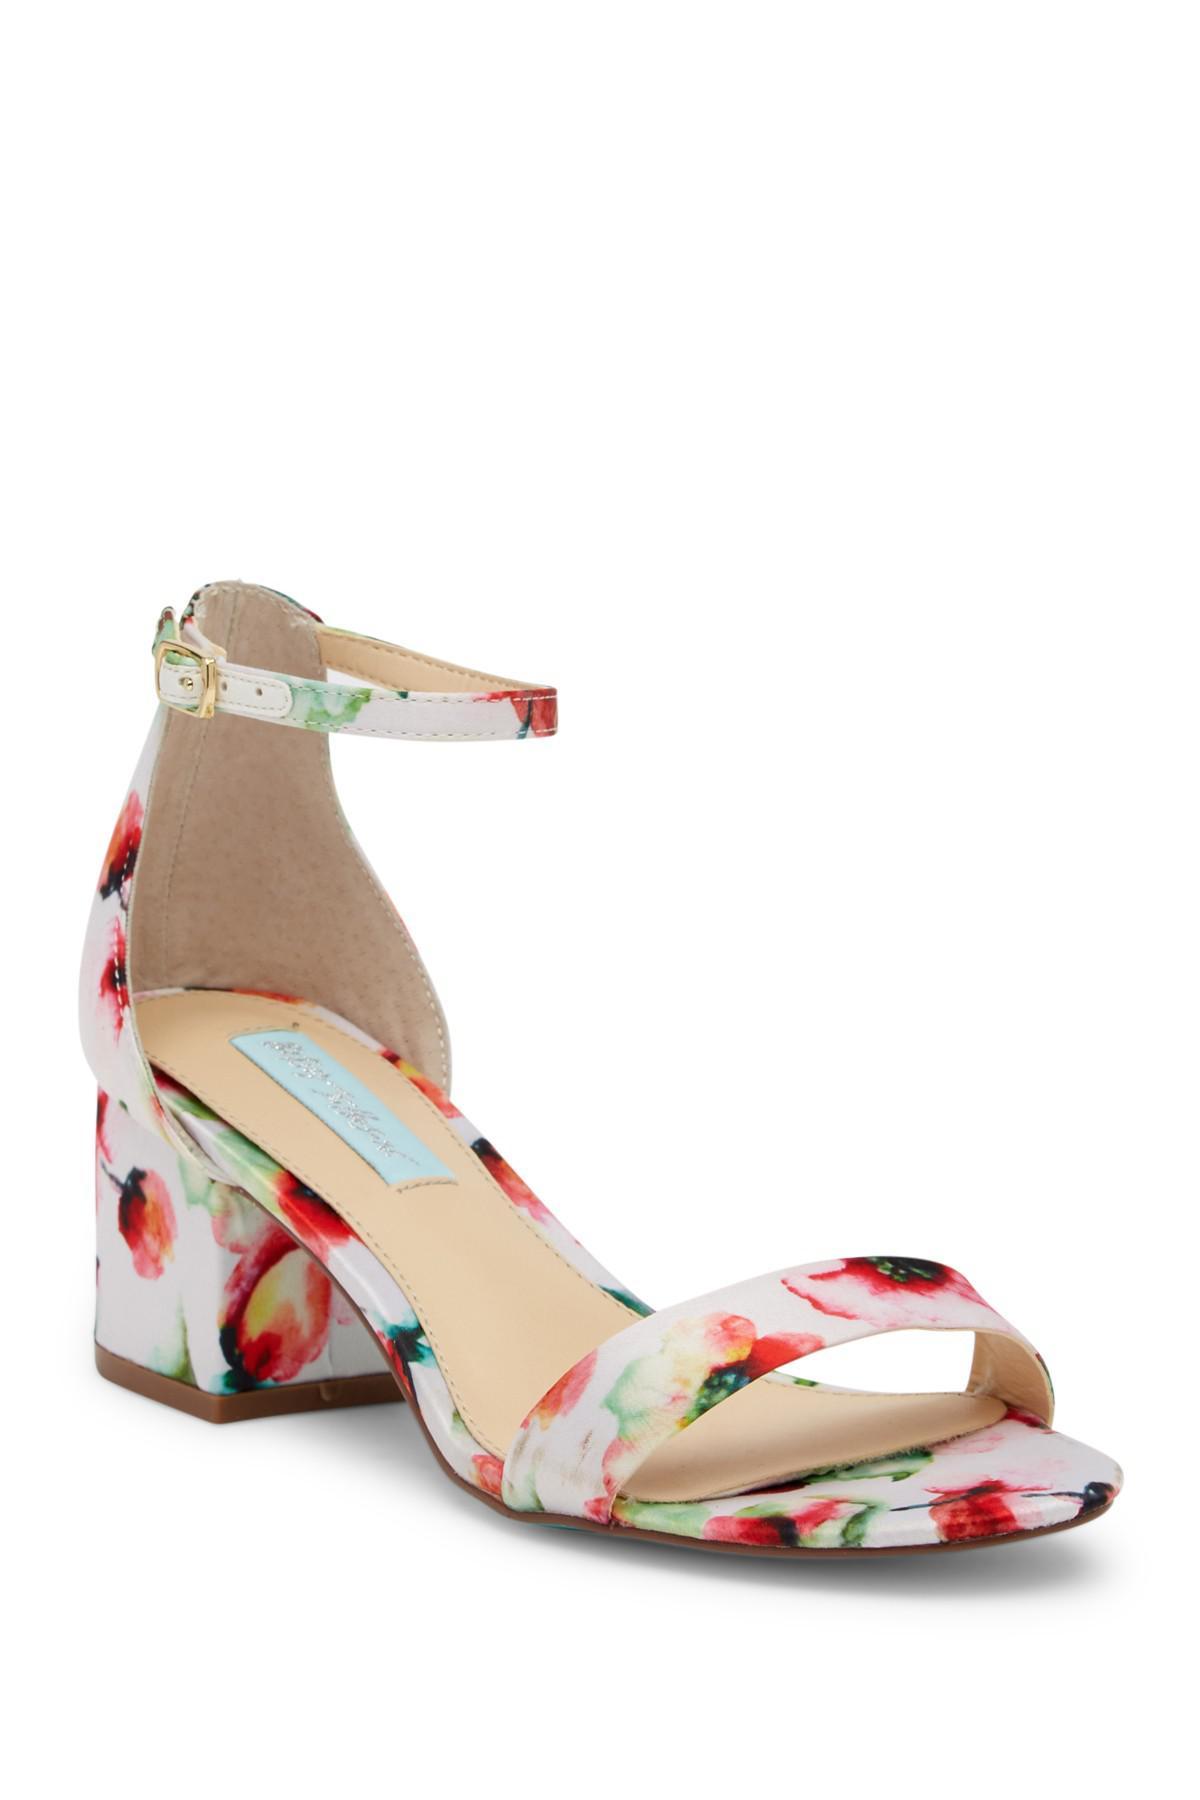 e8a2a74b149 Lyst - Betsey Johnson Jayce Glitter Block Heel Sandal